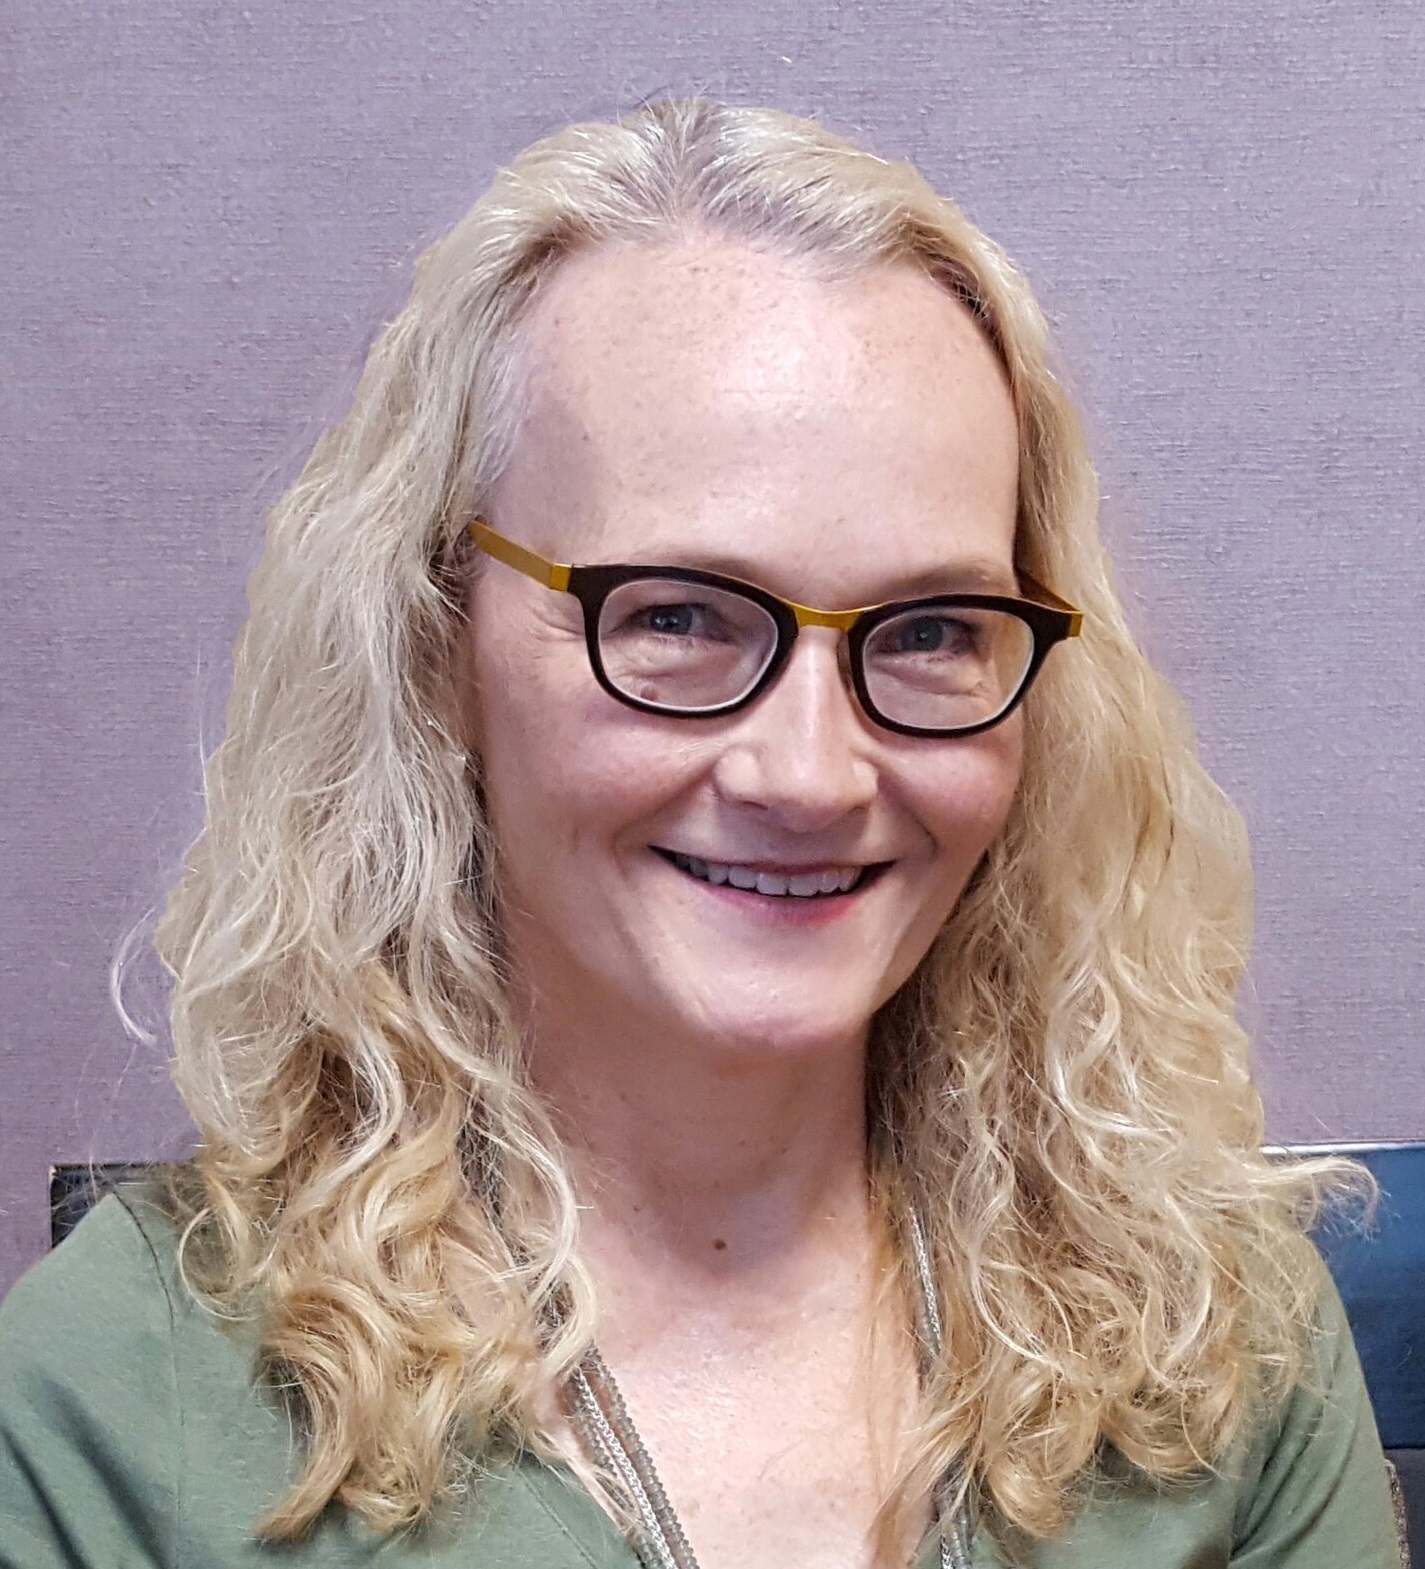 Kelly Phillips